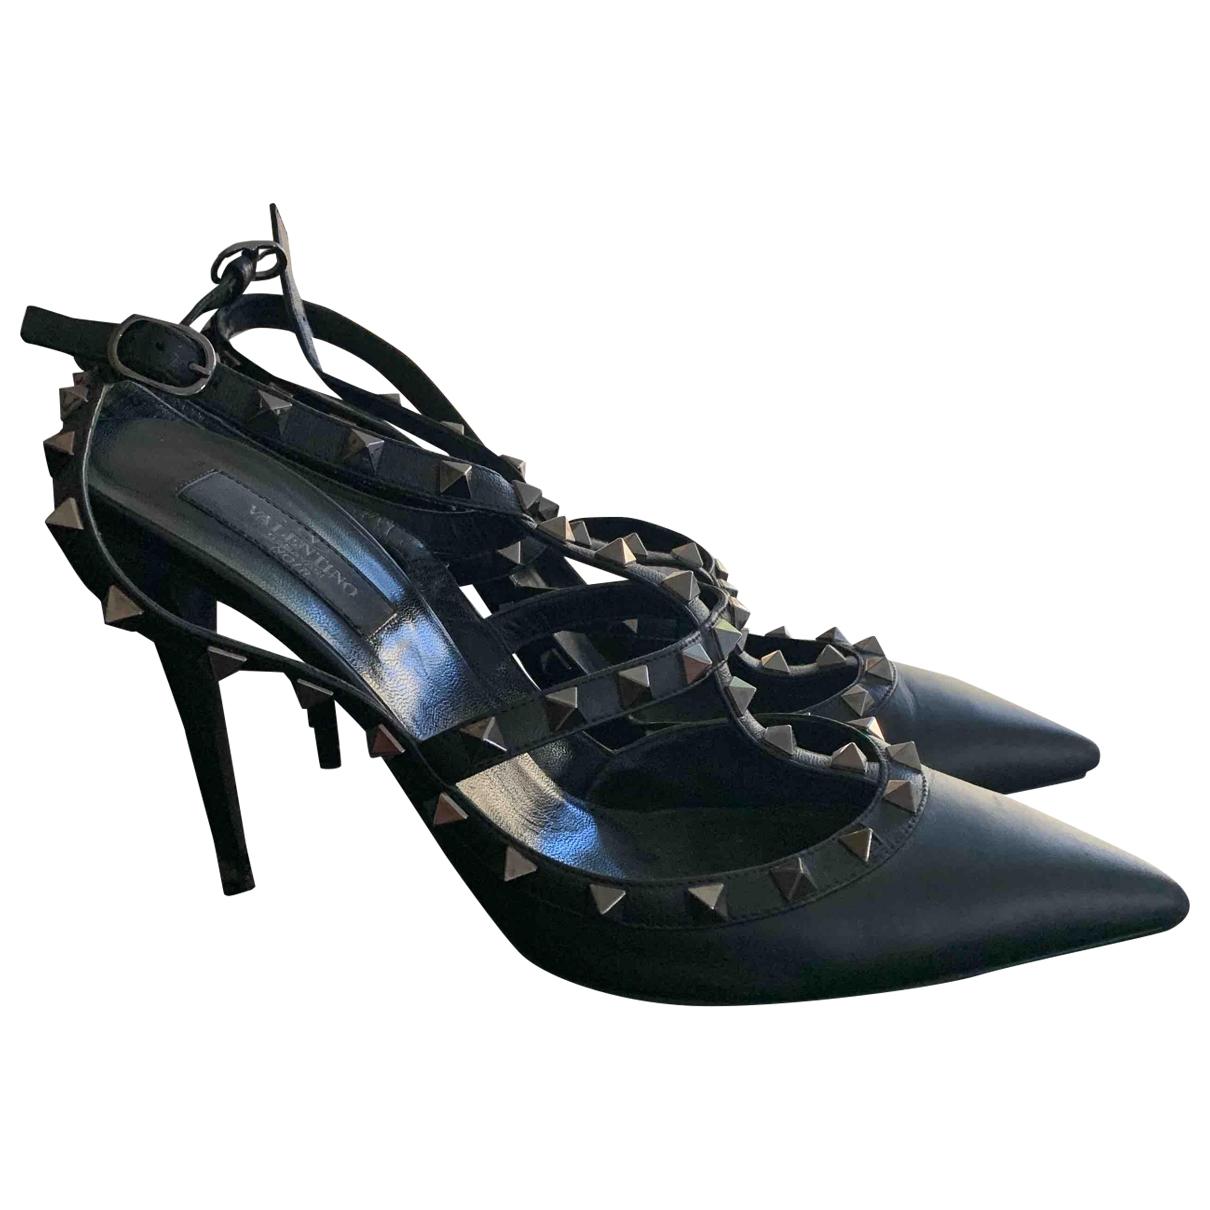 Valentino Garavani Rockstud Black Patent leather Heels for Women 41 EU